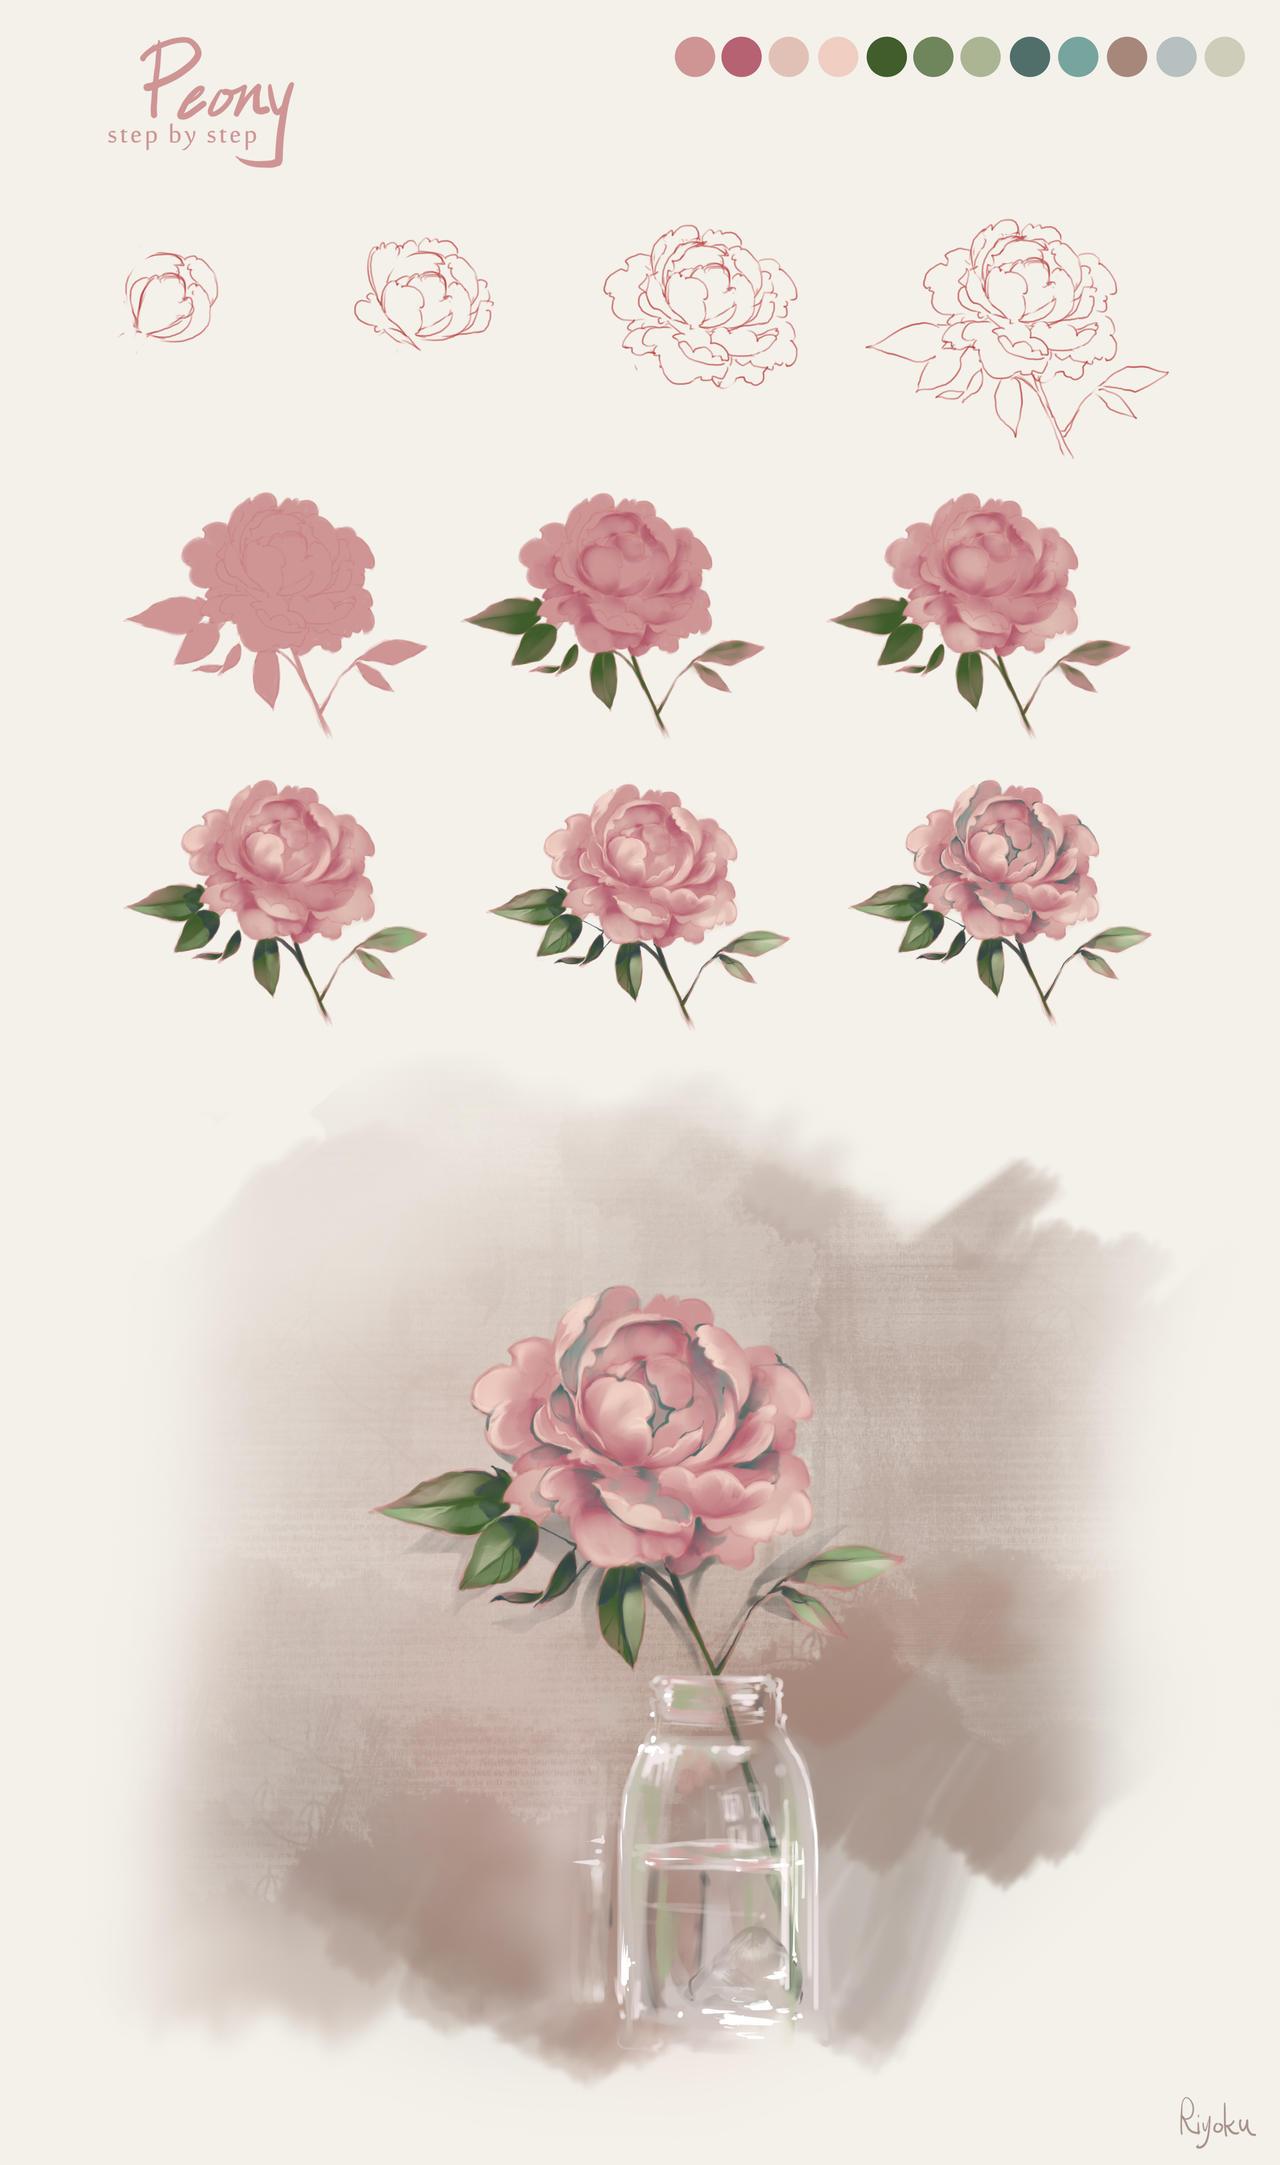 Flower Tutorial - Peony by Nyanfood